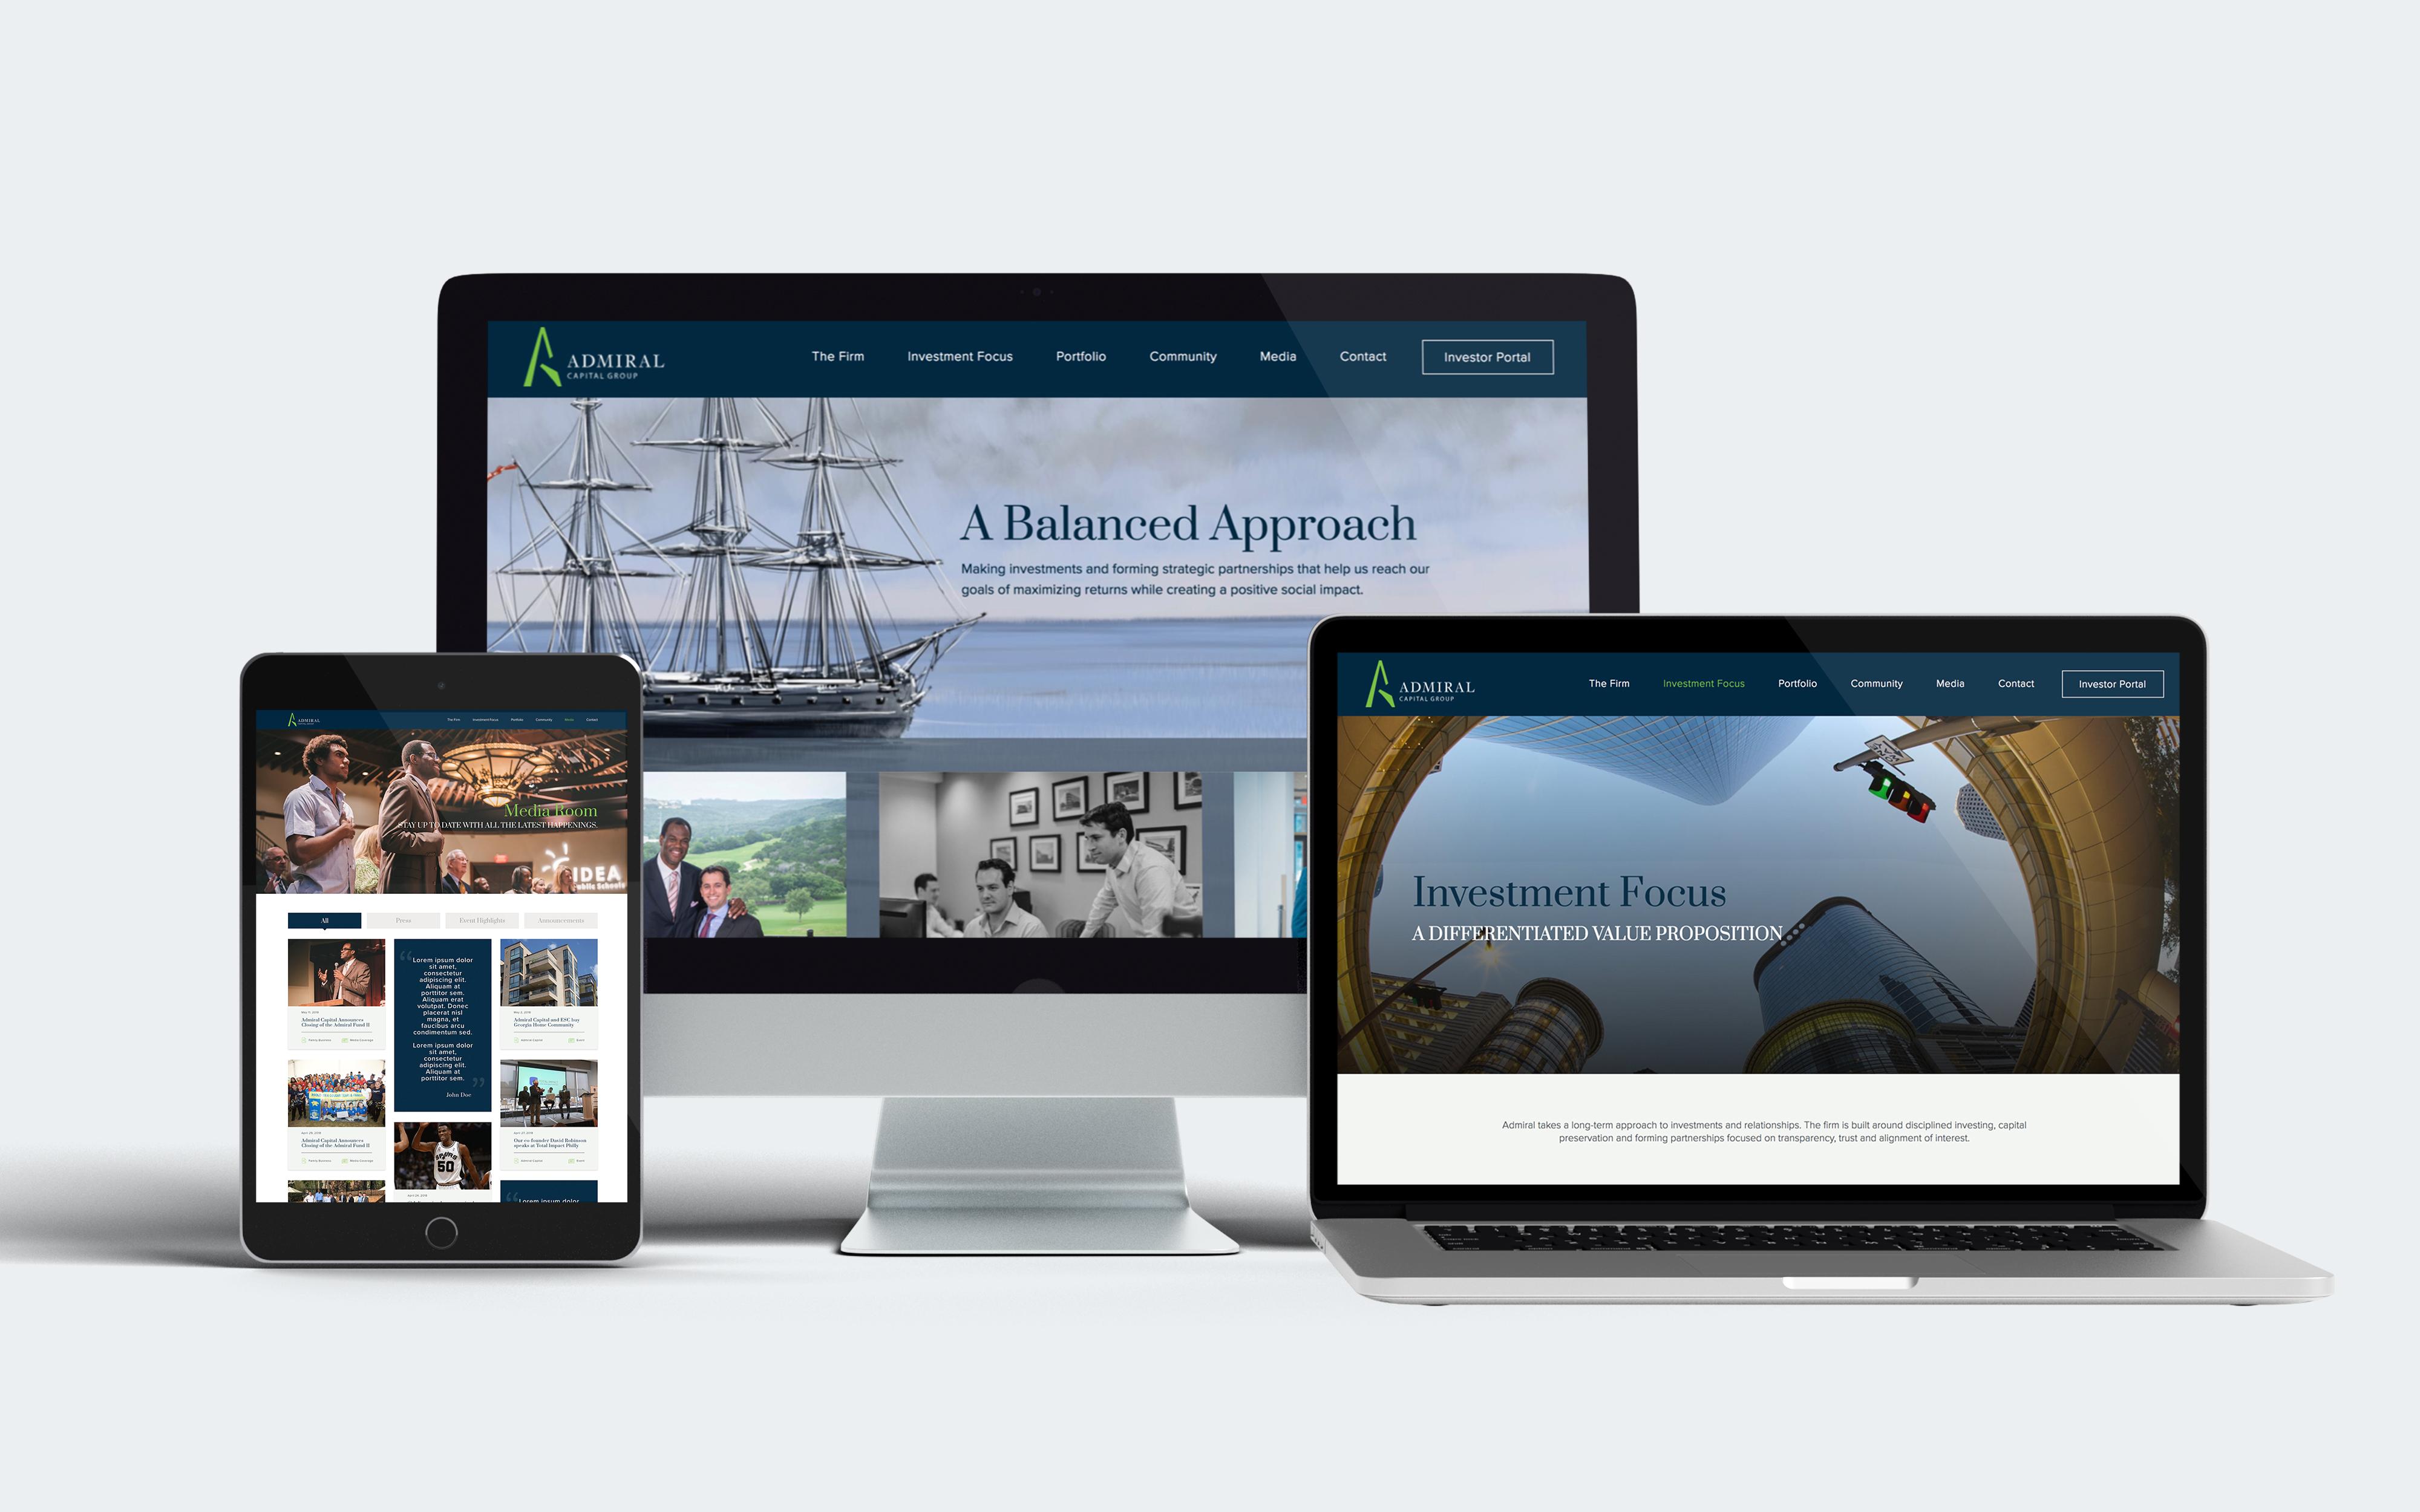 Ruckus – Admiral Capital Group